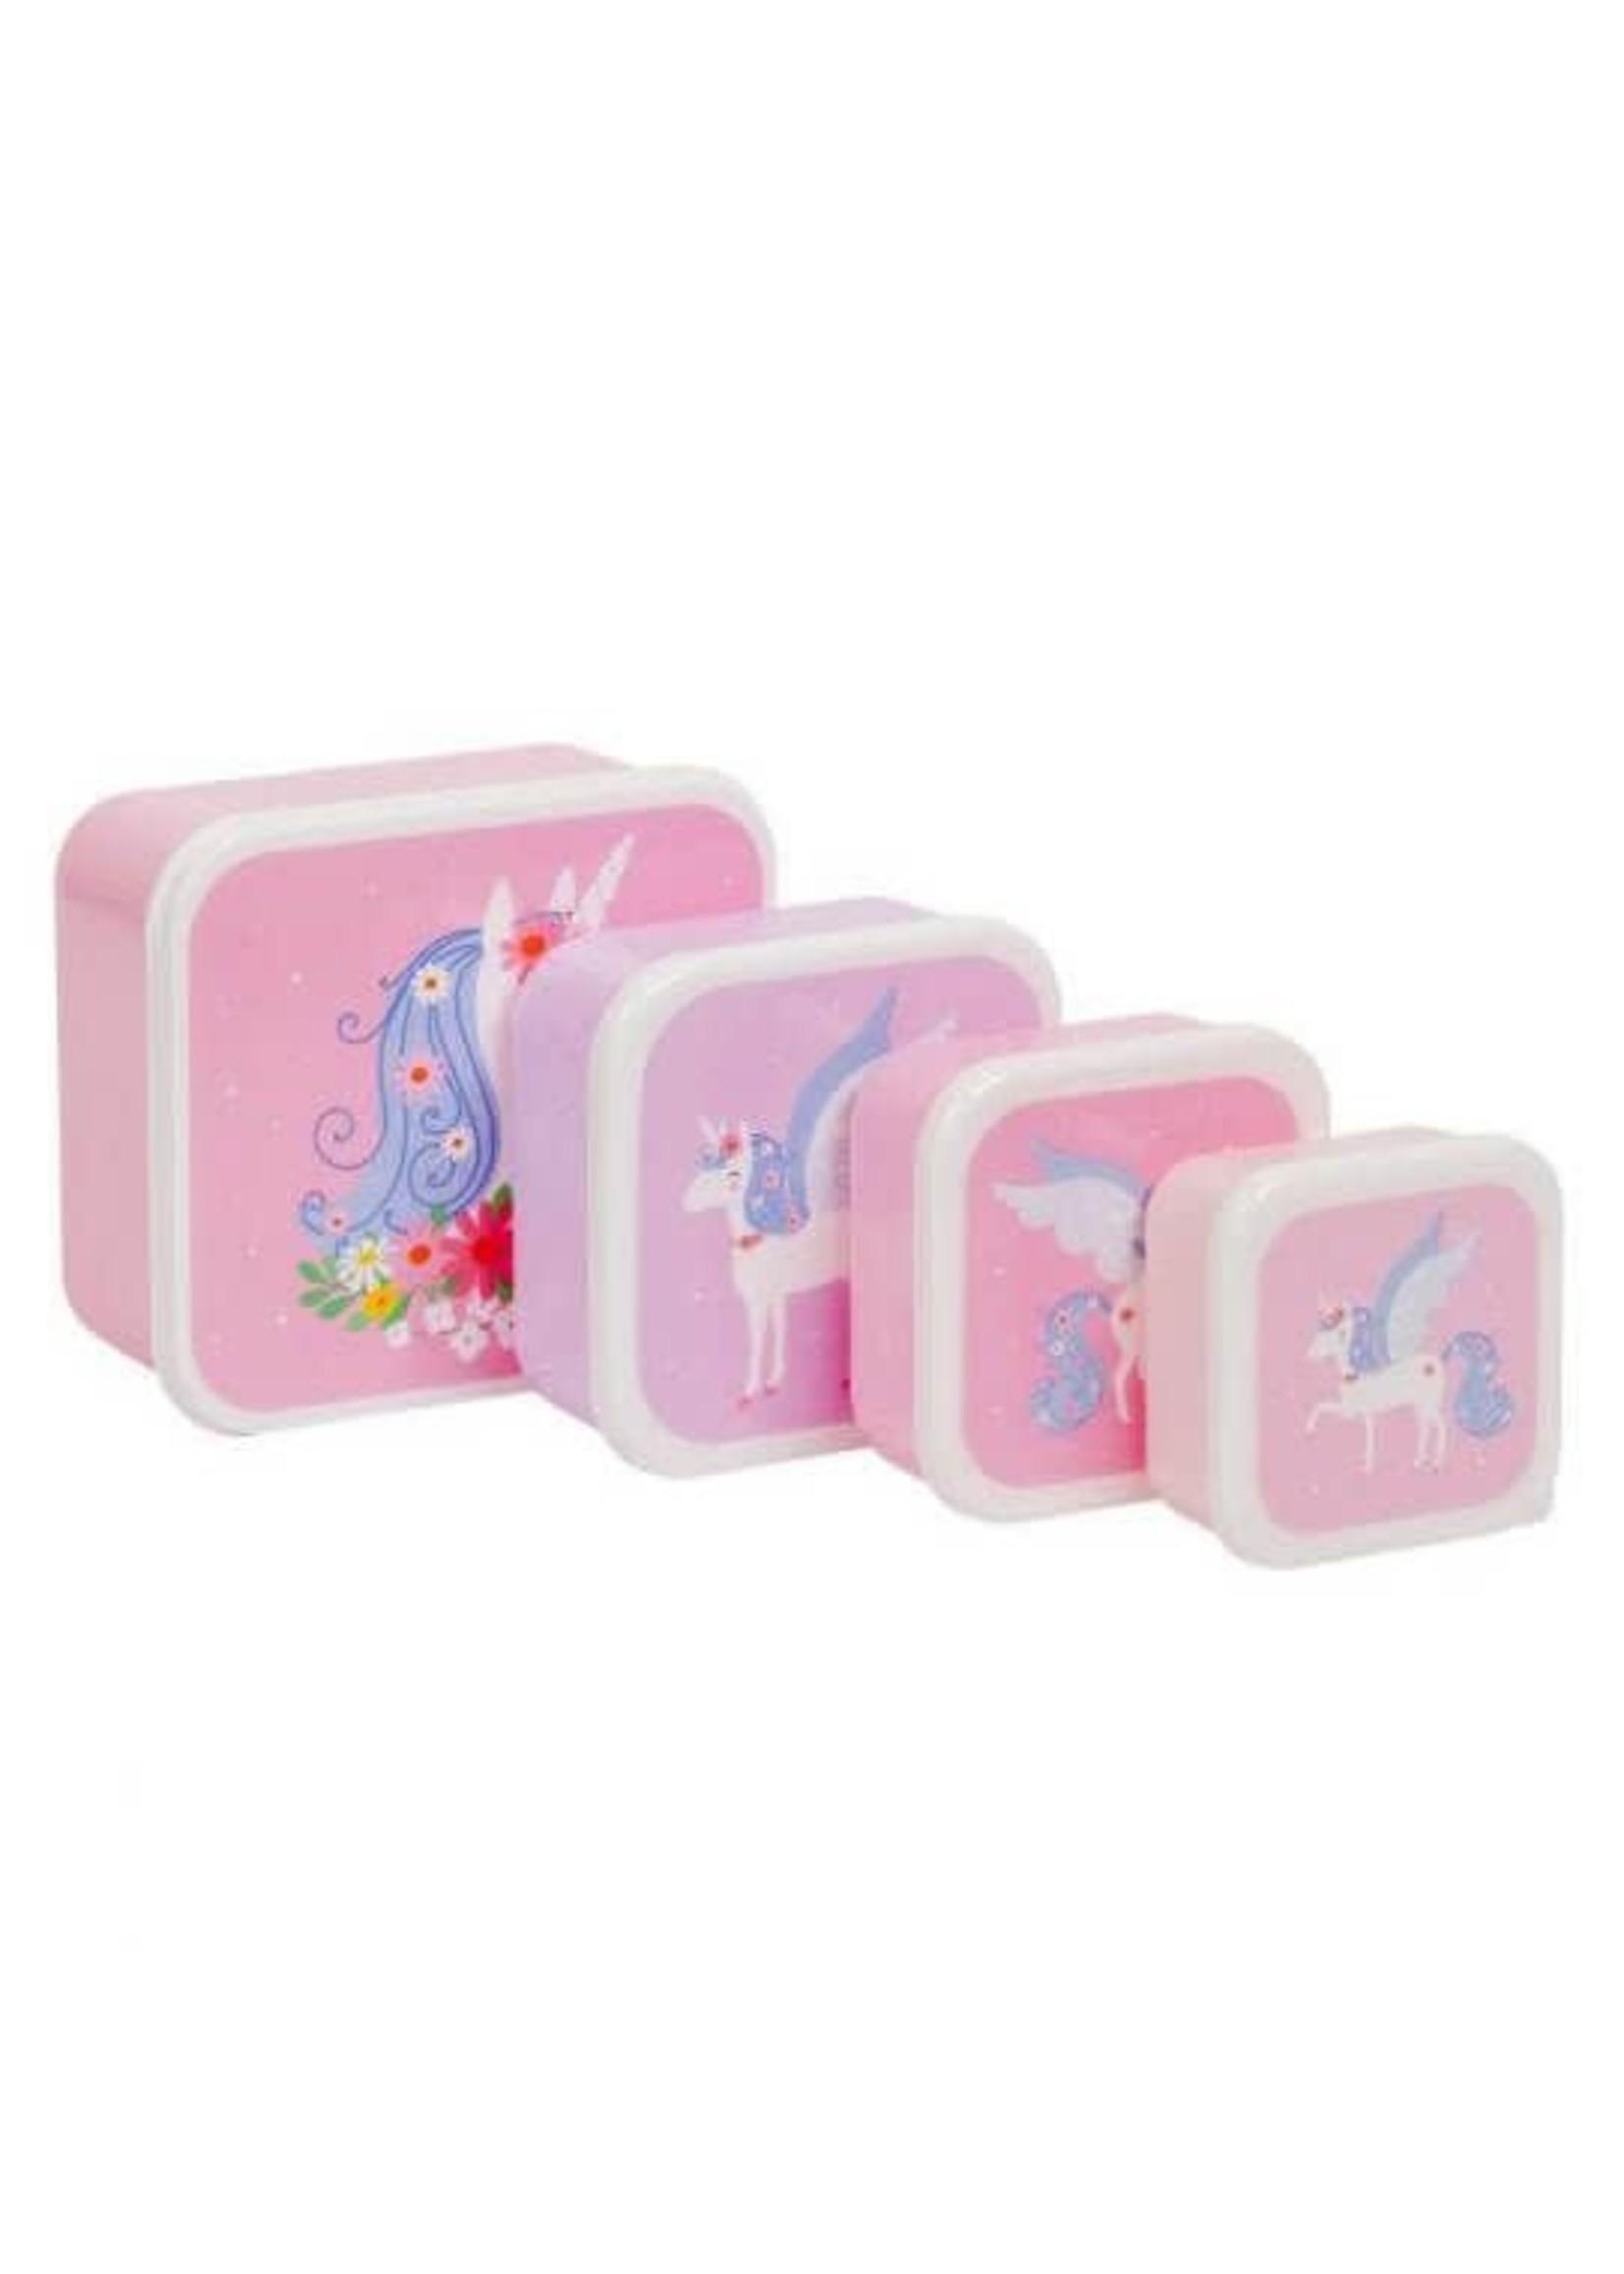 A Little Lovely Co. Little Lovely Lunch & Snack Box Set (Unicorn)